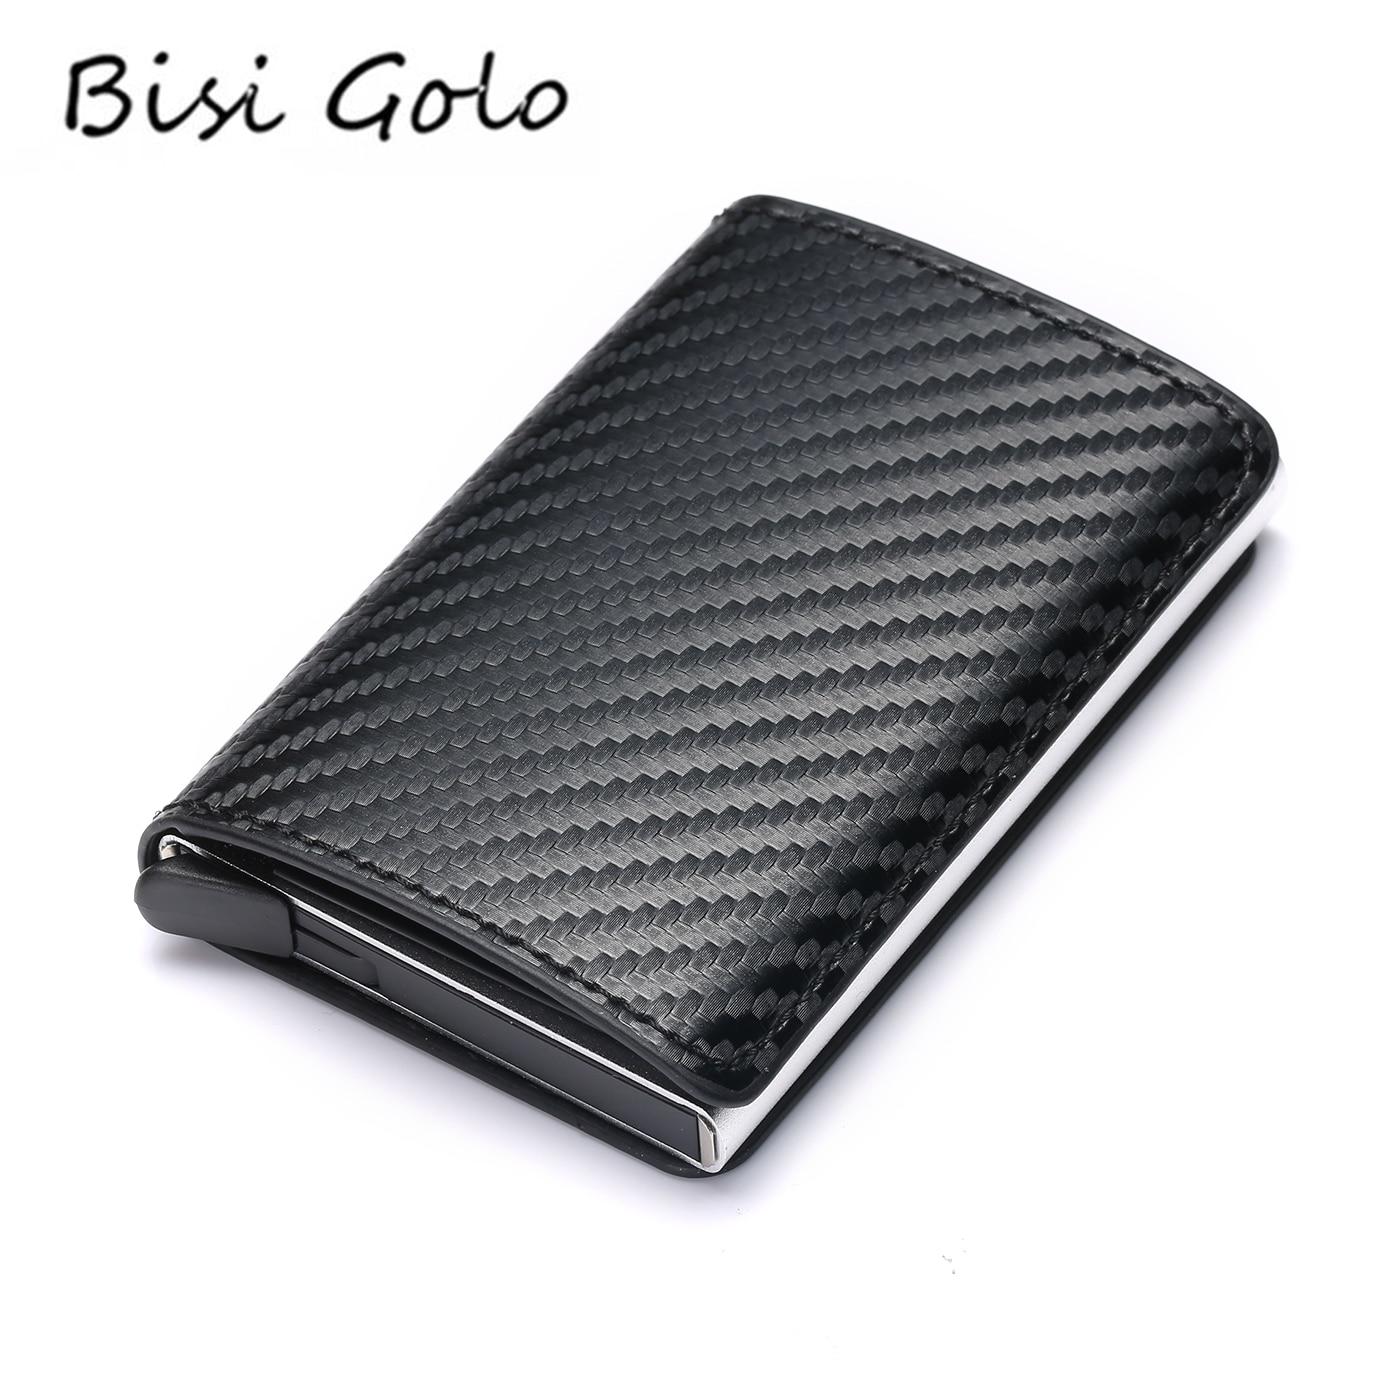 Card Wallet Carbon-Fiber Rfid Blocking Bisi Goro Slim Aluminum Fashion